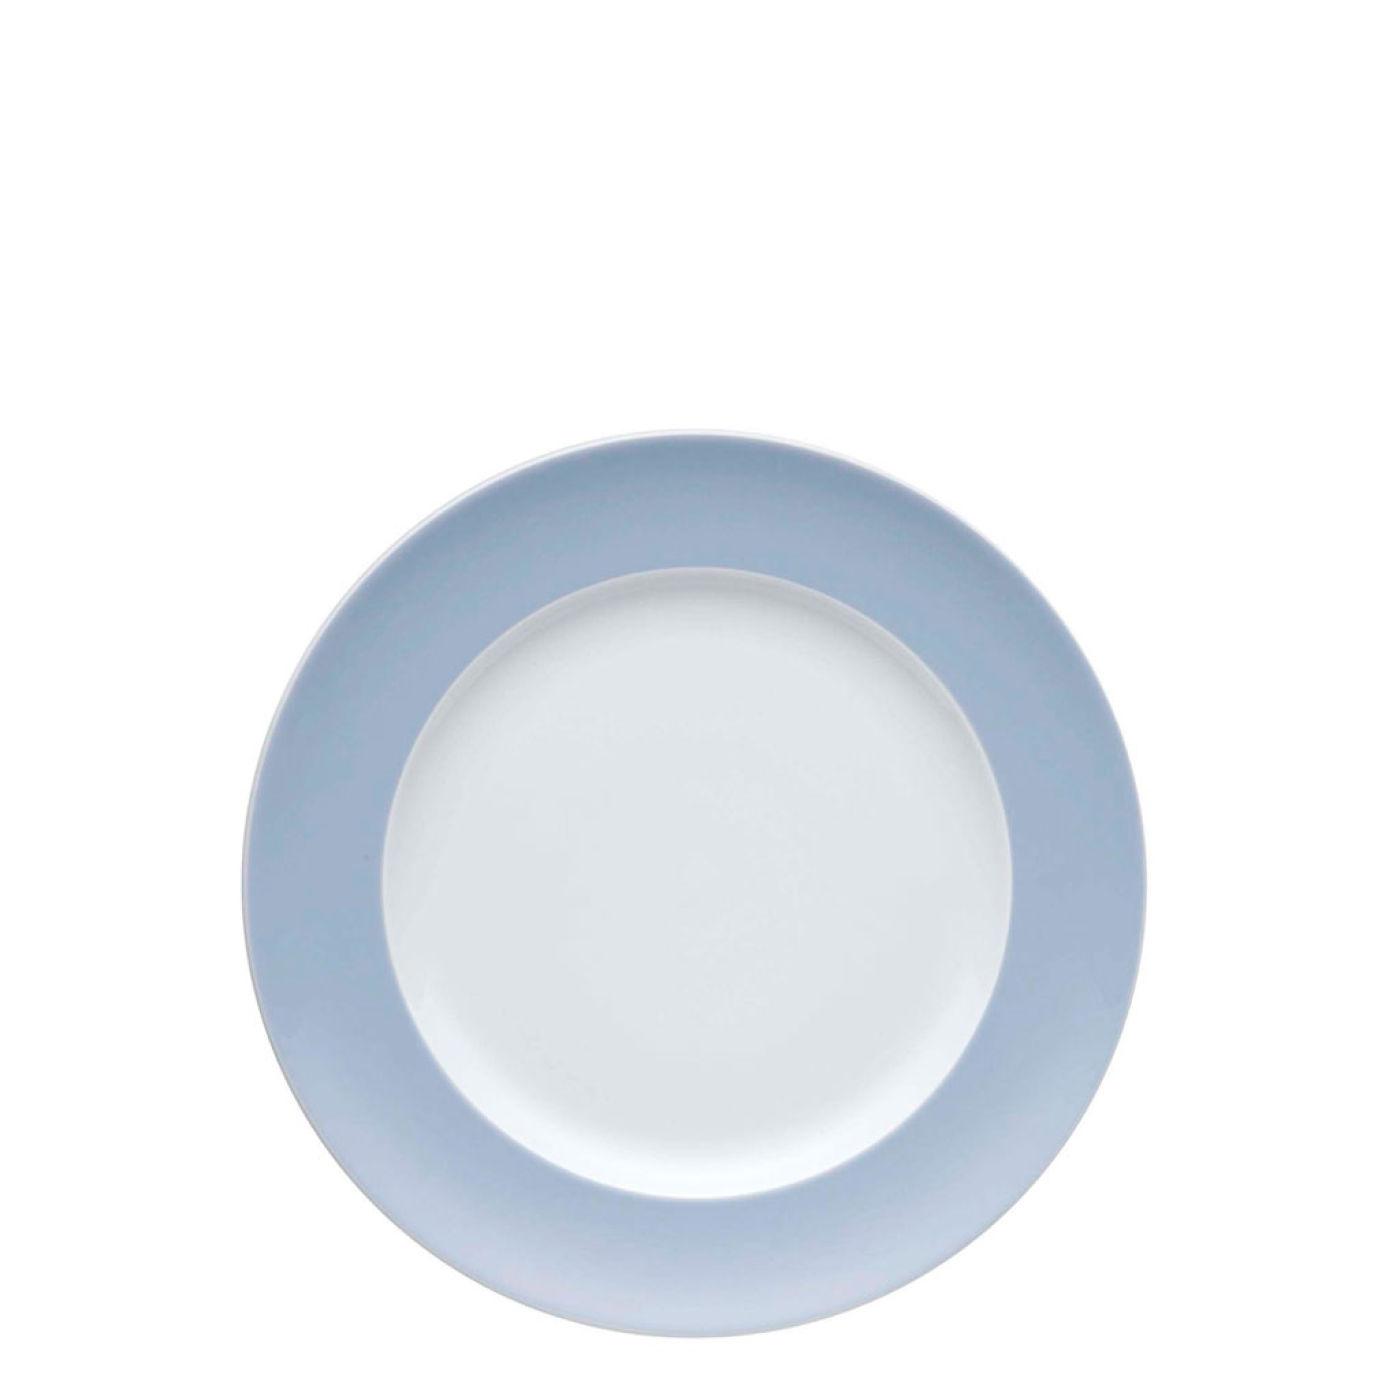 Тарелка десертная/закусочная Rosenthal SUNNY DAY, диаметр 22 см, голубой Rosenthal 70850-408510-10222 фото 0